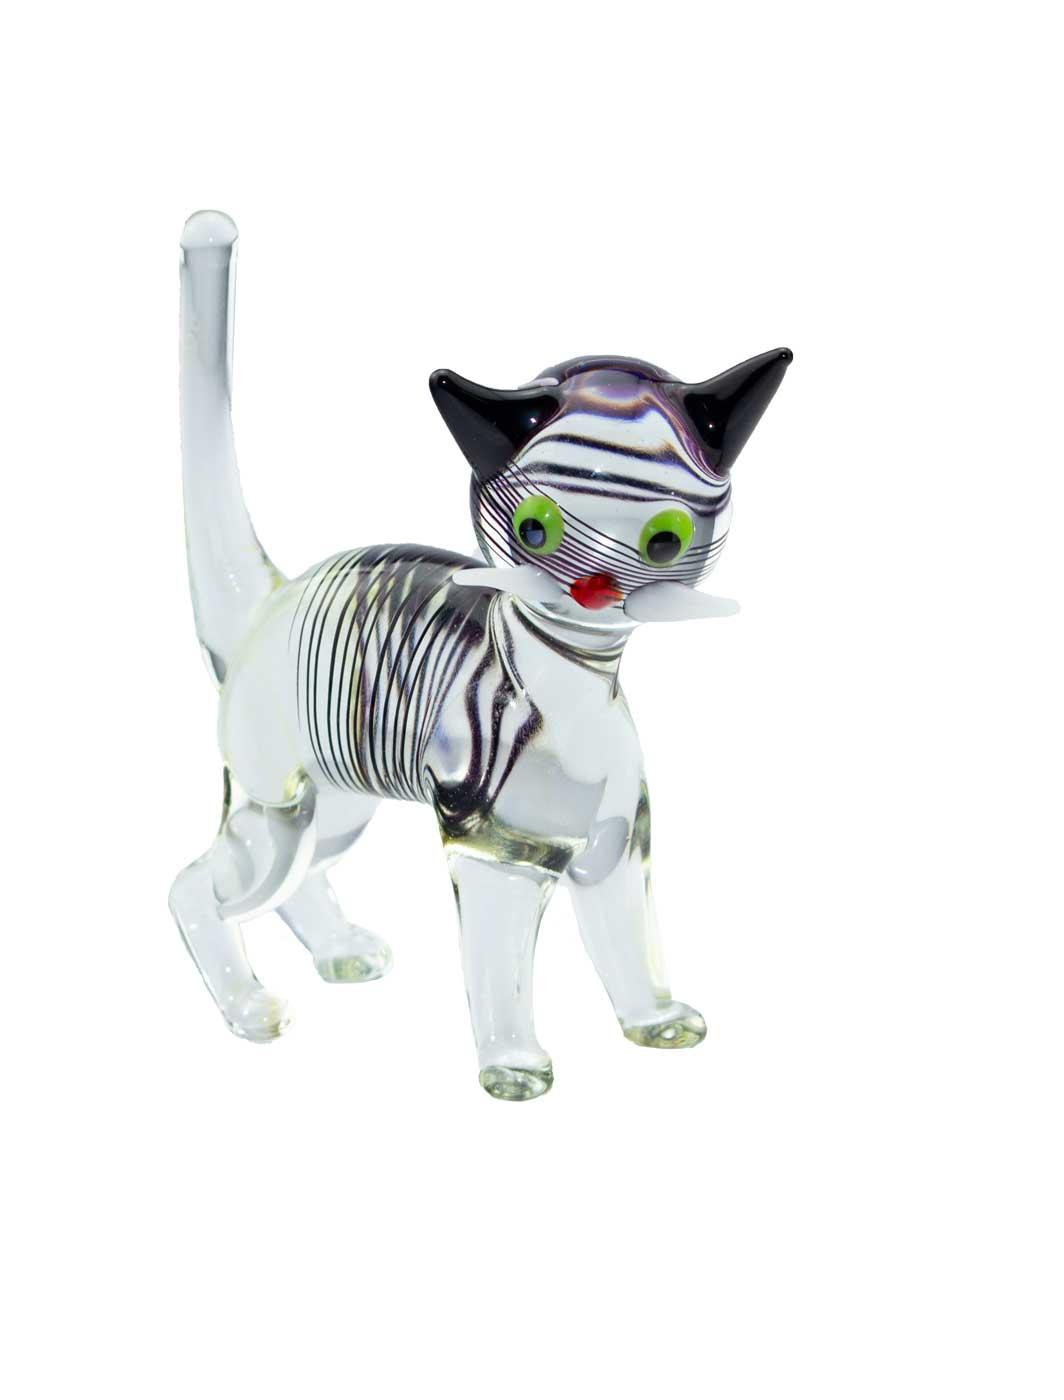 Glasfigur Katze kristall gestreift